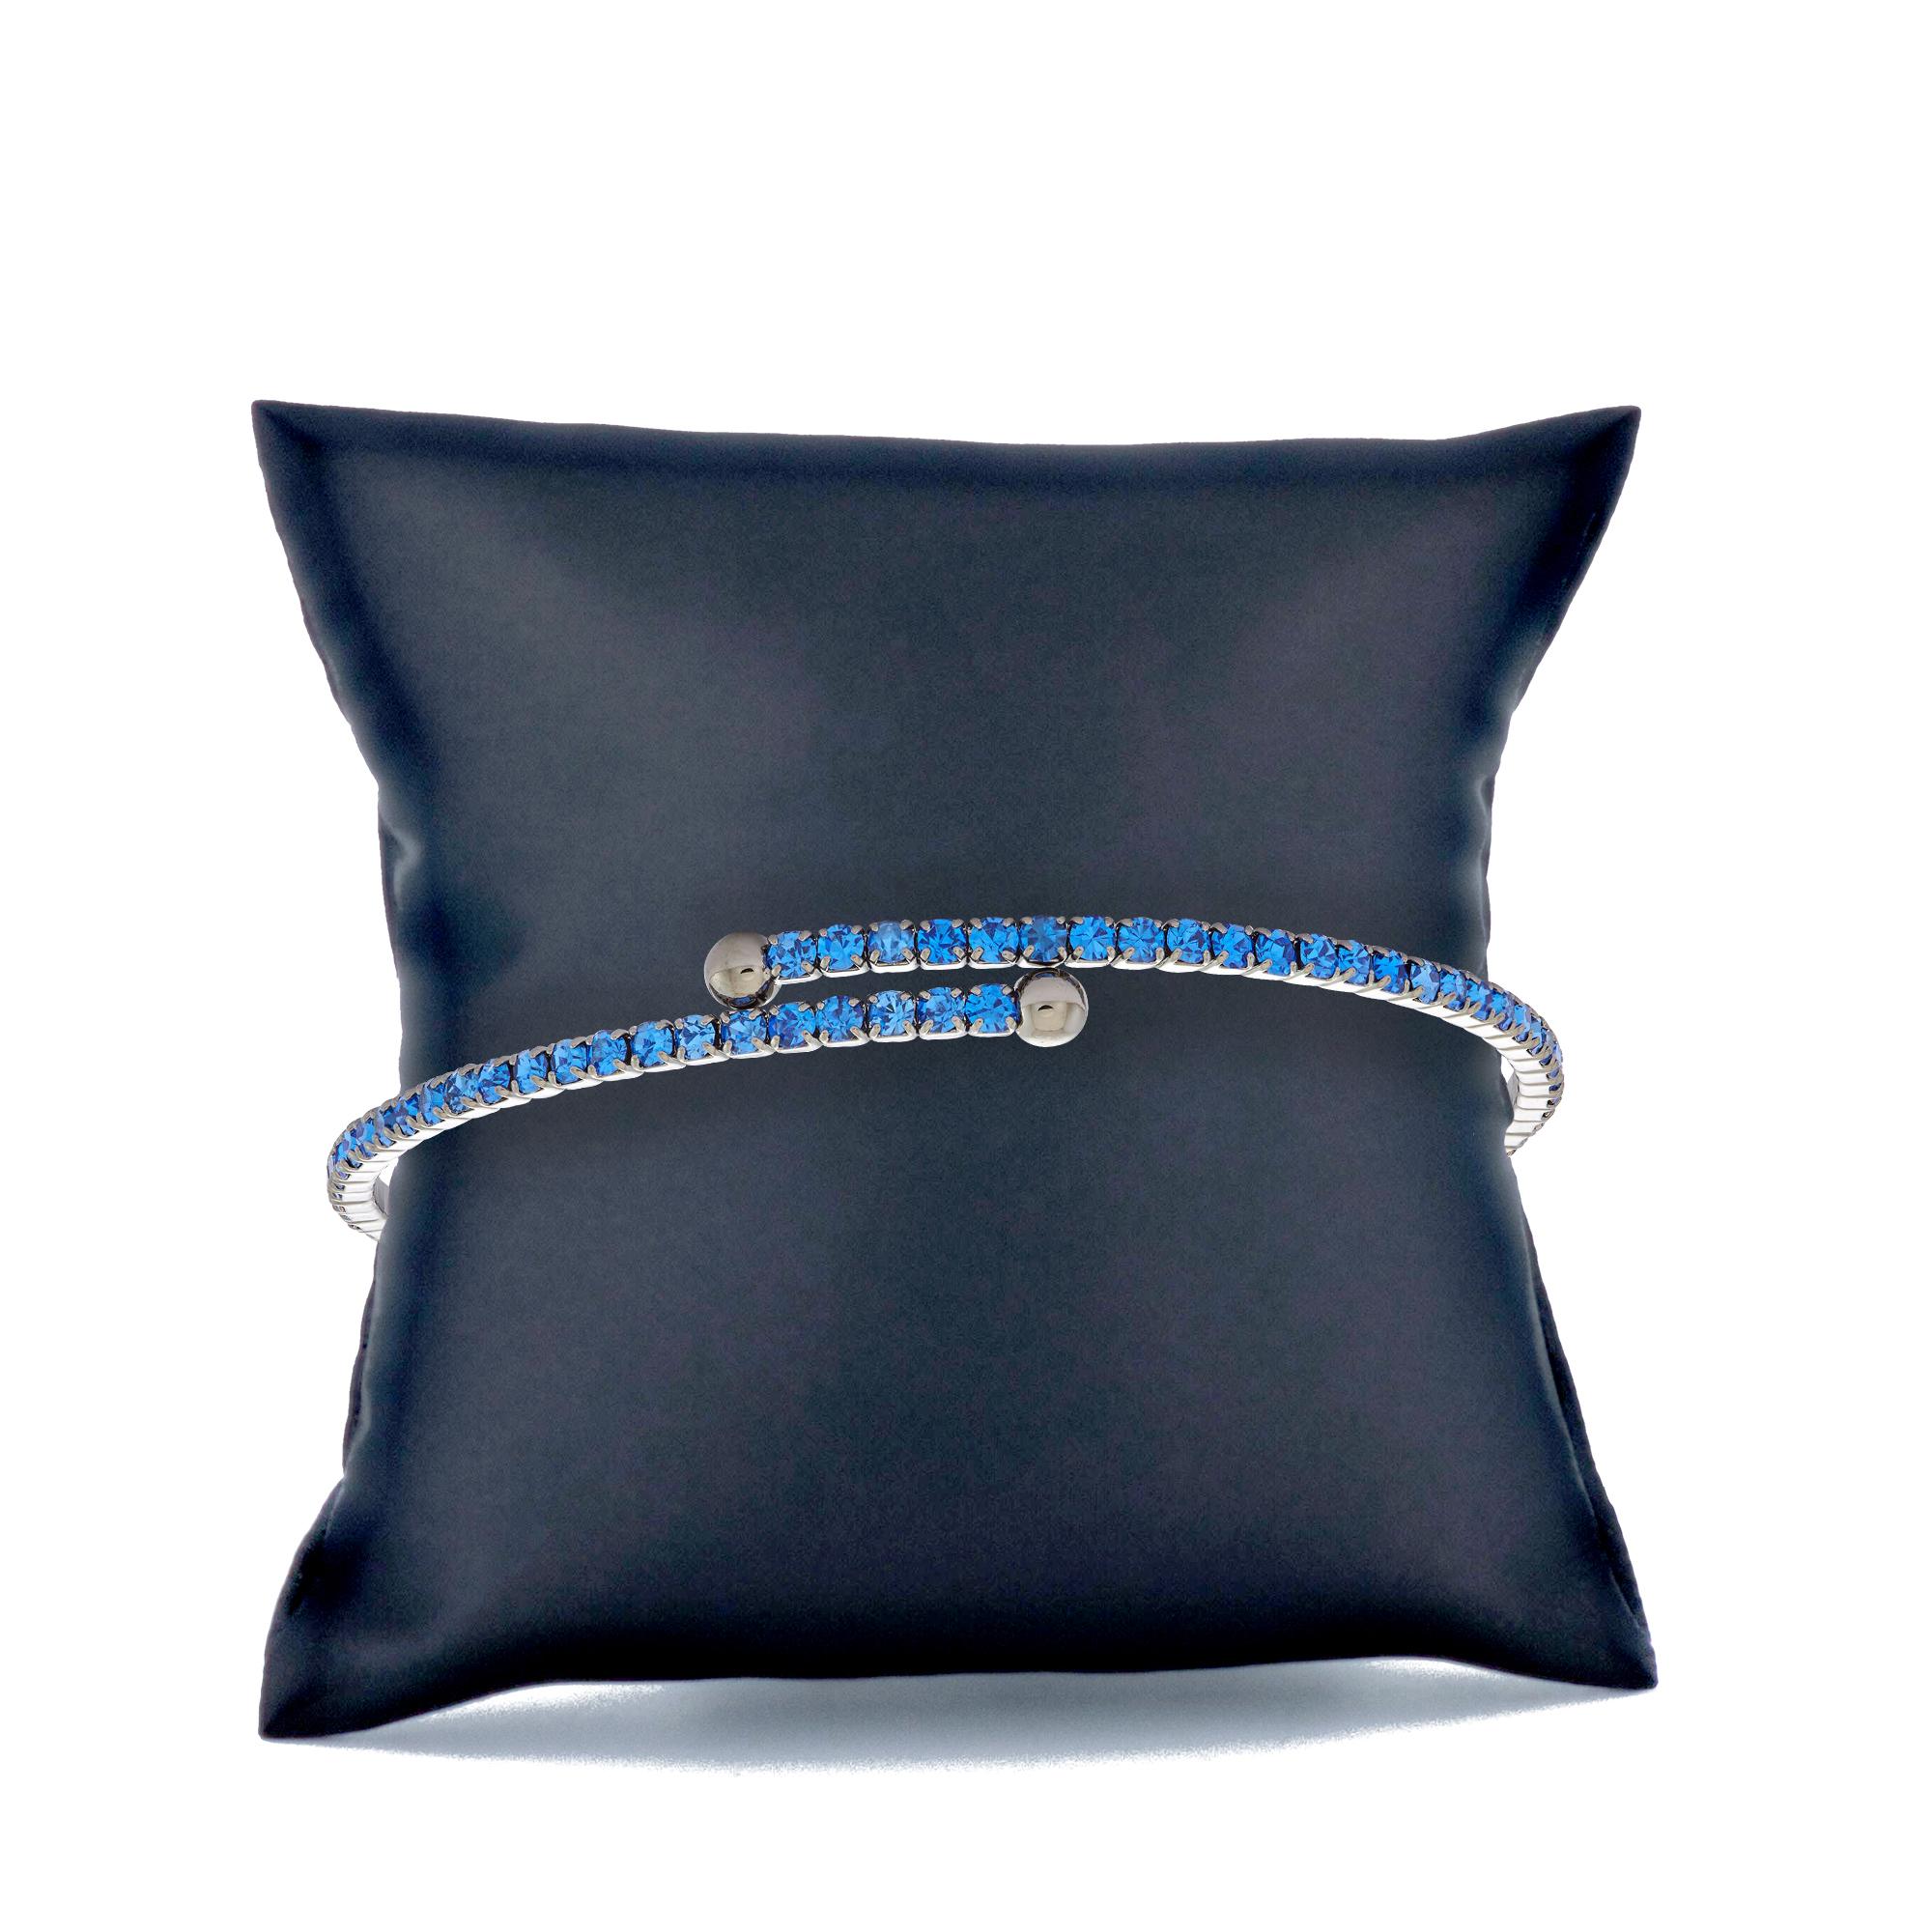 Womens-Ladies-Fashion-Accessories-Jewelry-Black-Rhodium-Plated-Bangle-Bracelet thumbnail 34